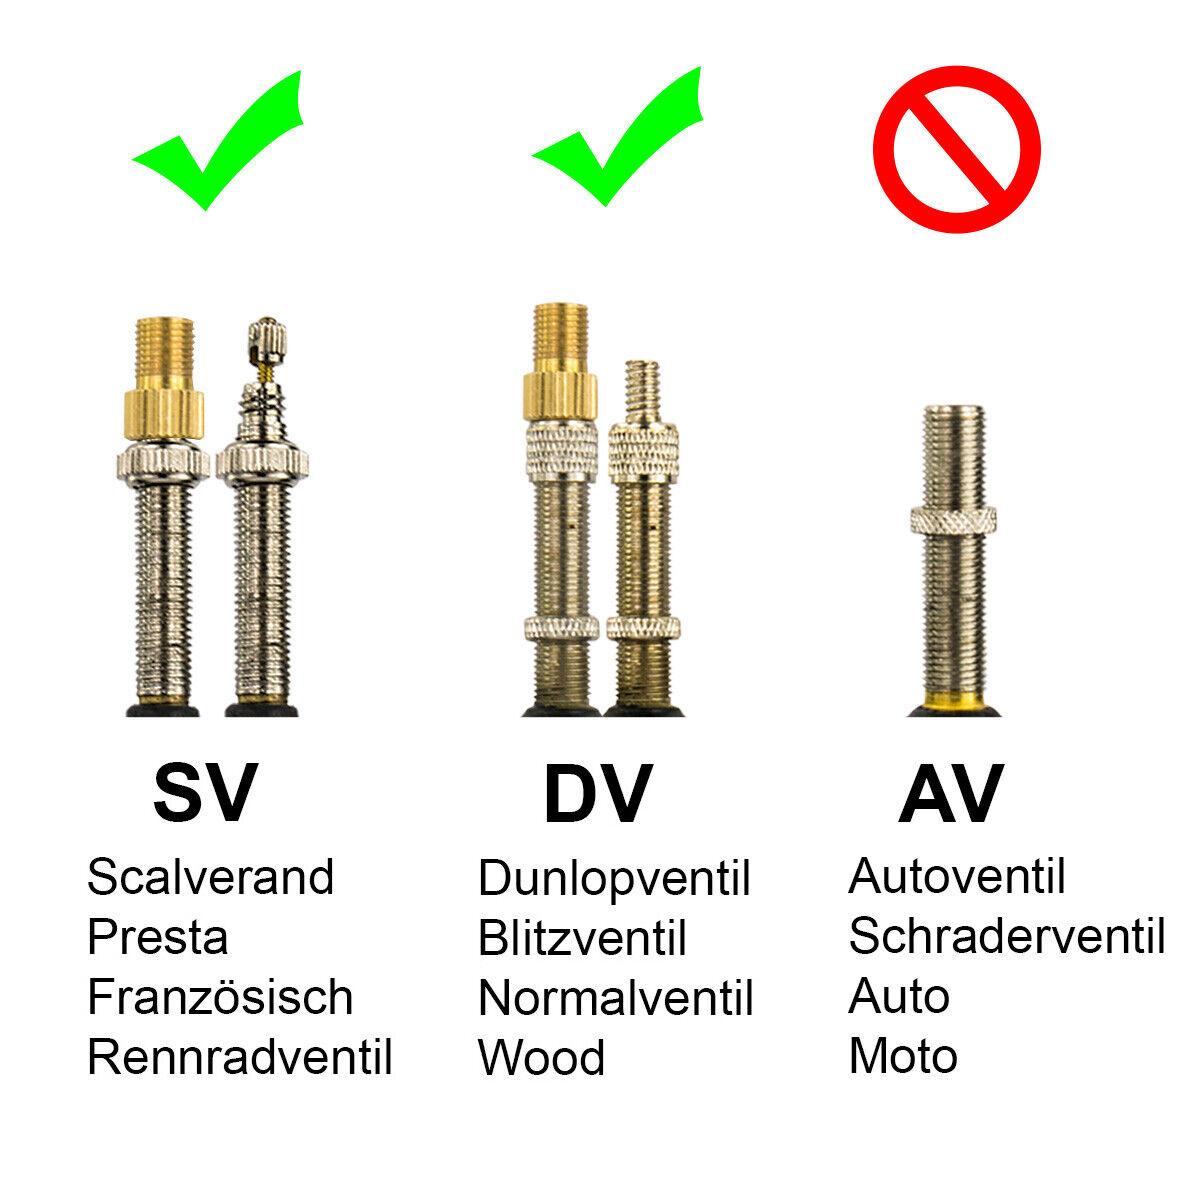 2x Ventiladapter Fahrrad auf Auto Adapter Sclaverand SV Dunlop DV auf Auto AV